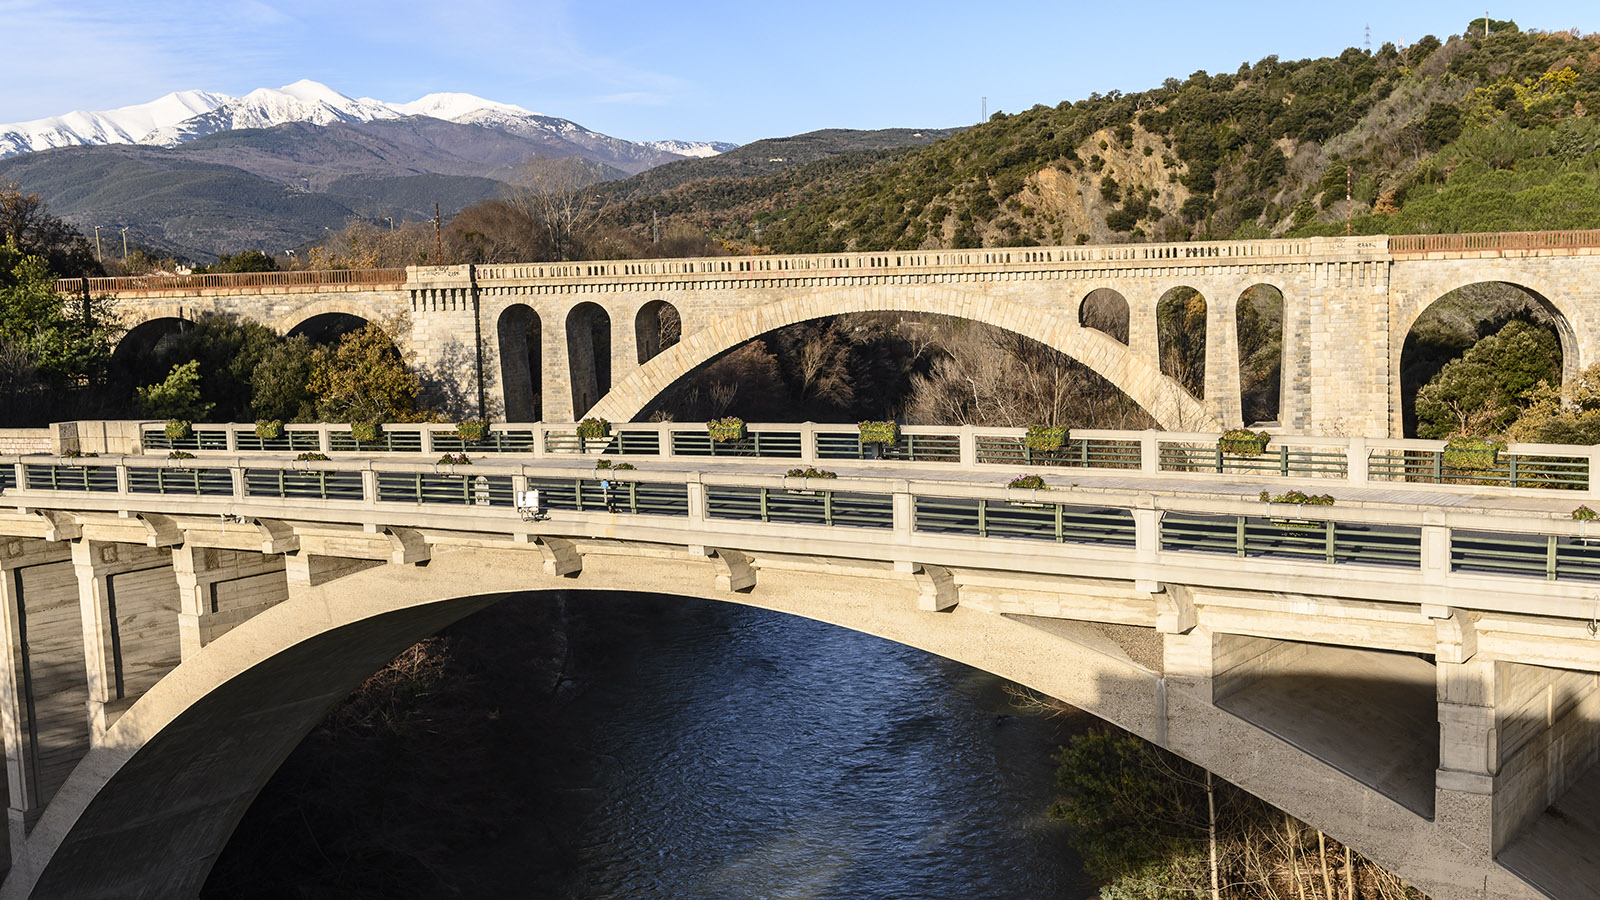 Jenseits der Brücken über den Tech grüßt der Canigou. Foto: Hilke Maunder